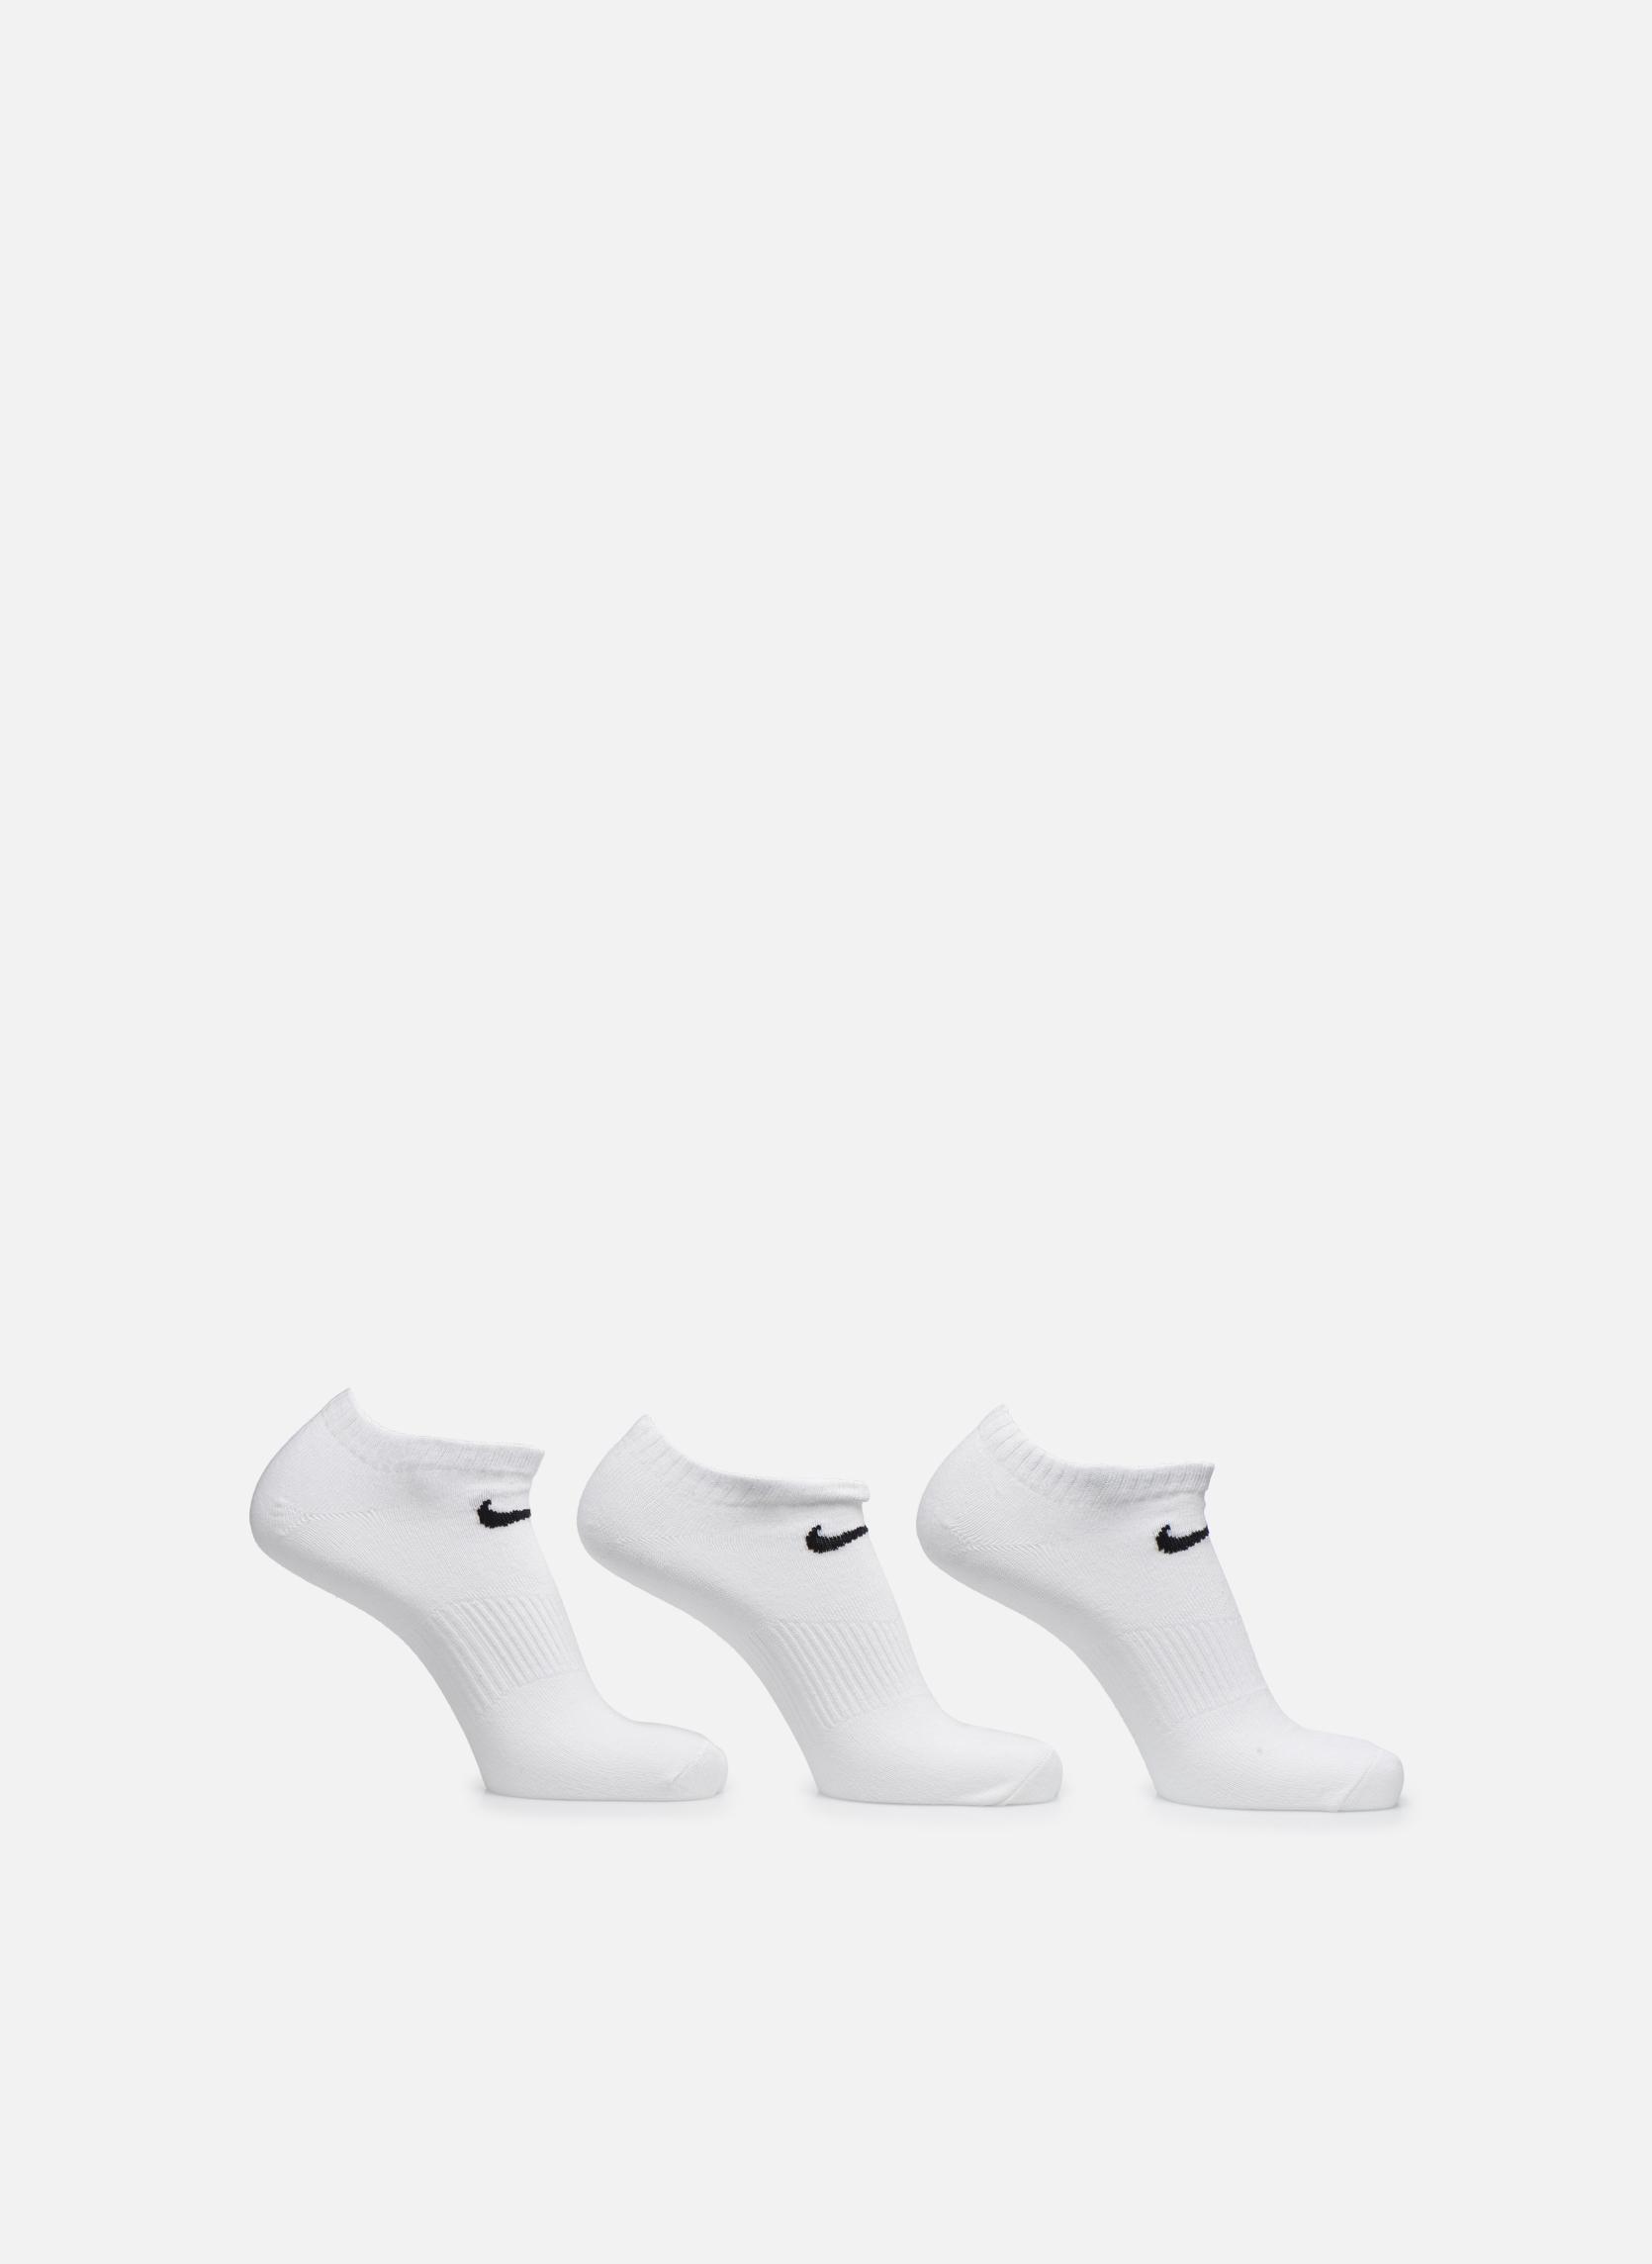 (3 pack) Nike Invisible socks WHITE(BLACK)